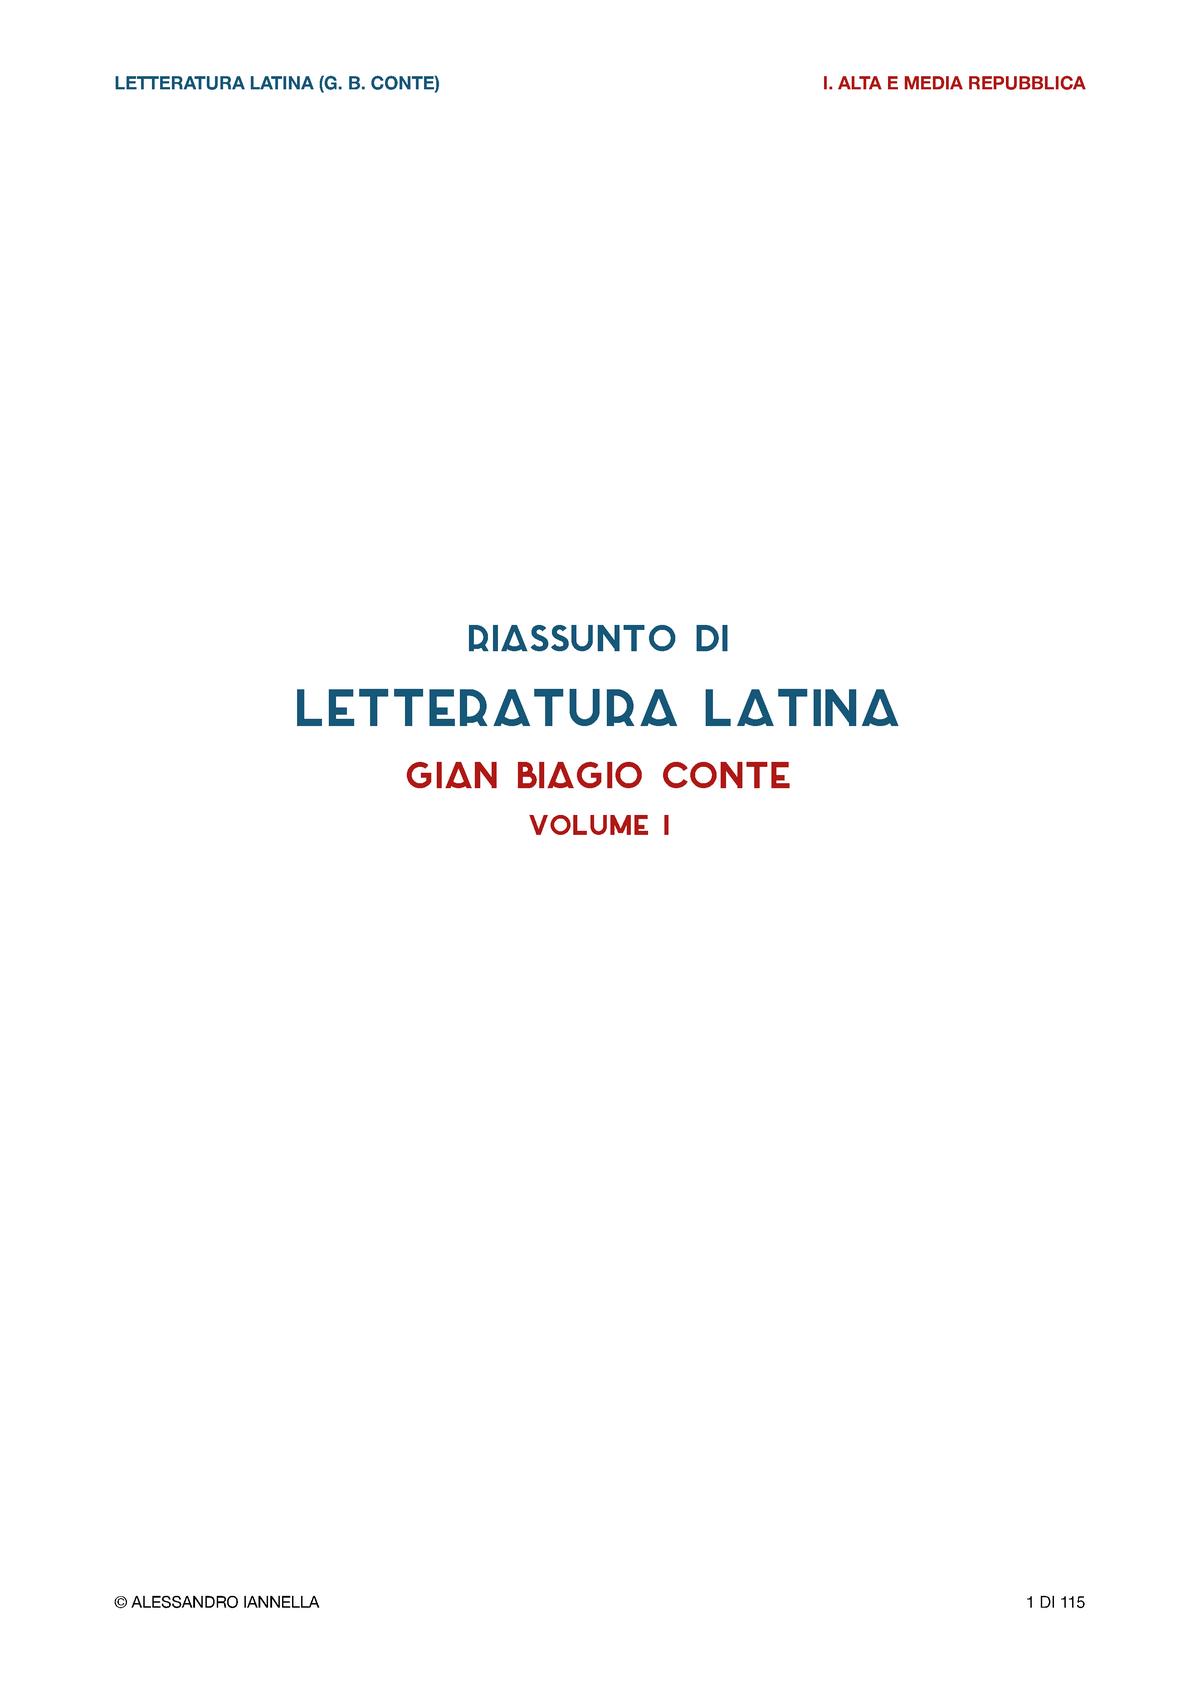 regole per la datazione di una latina